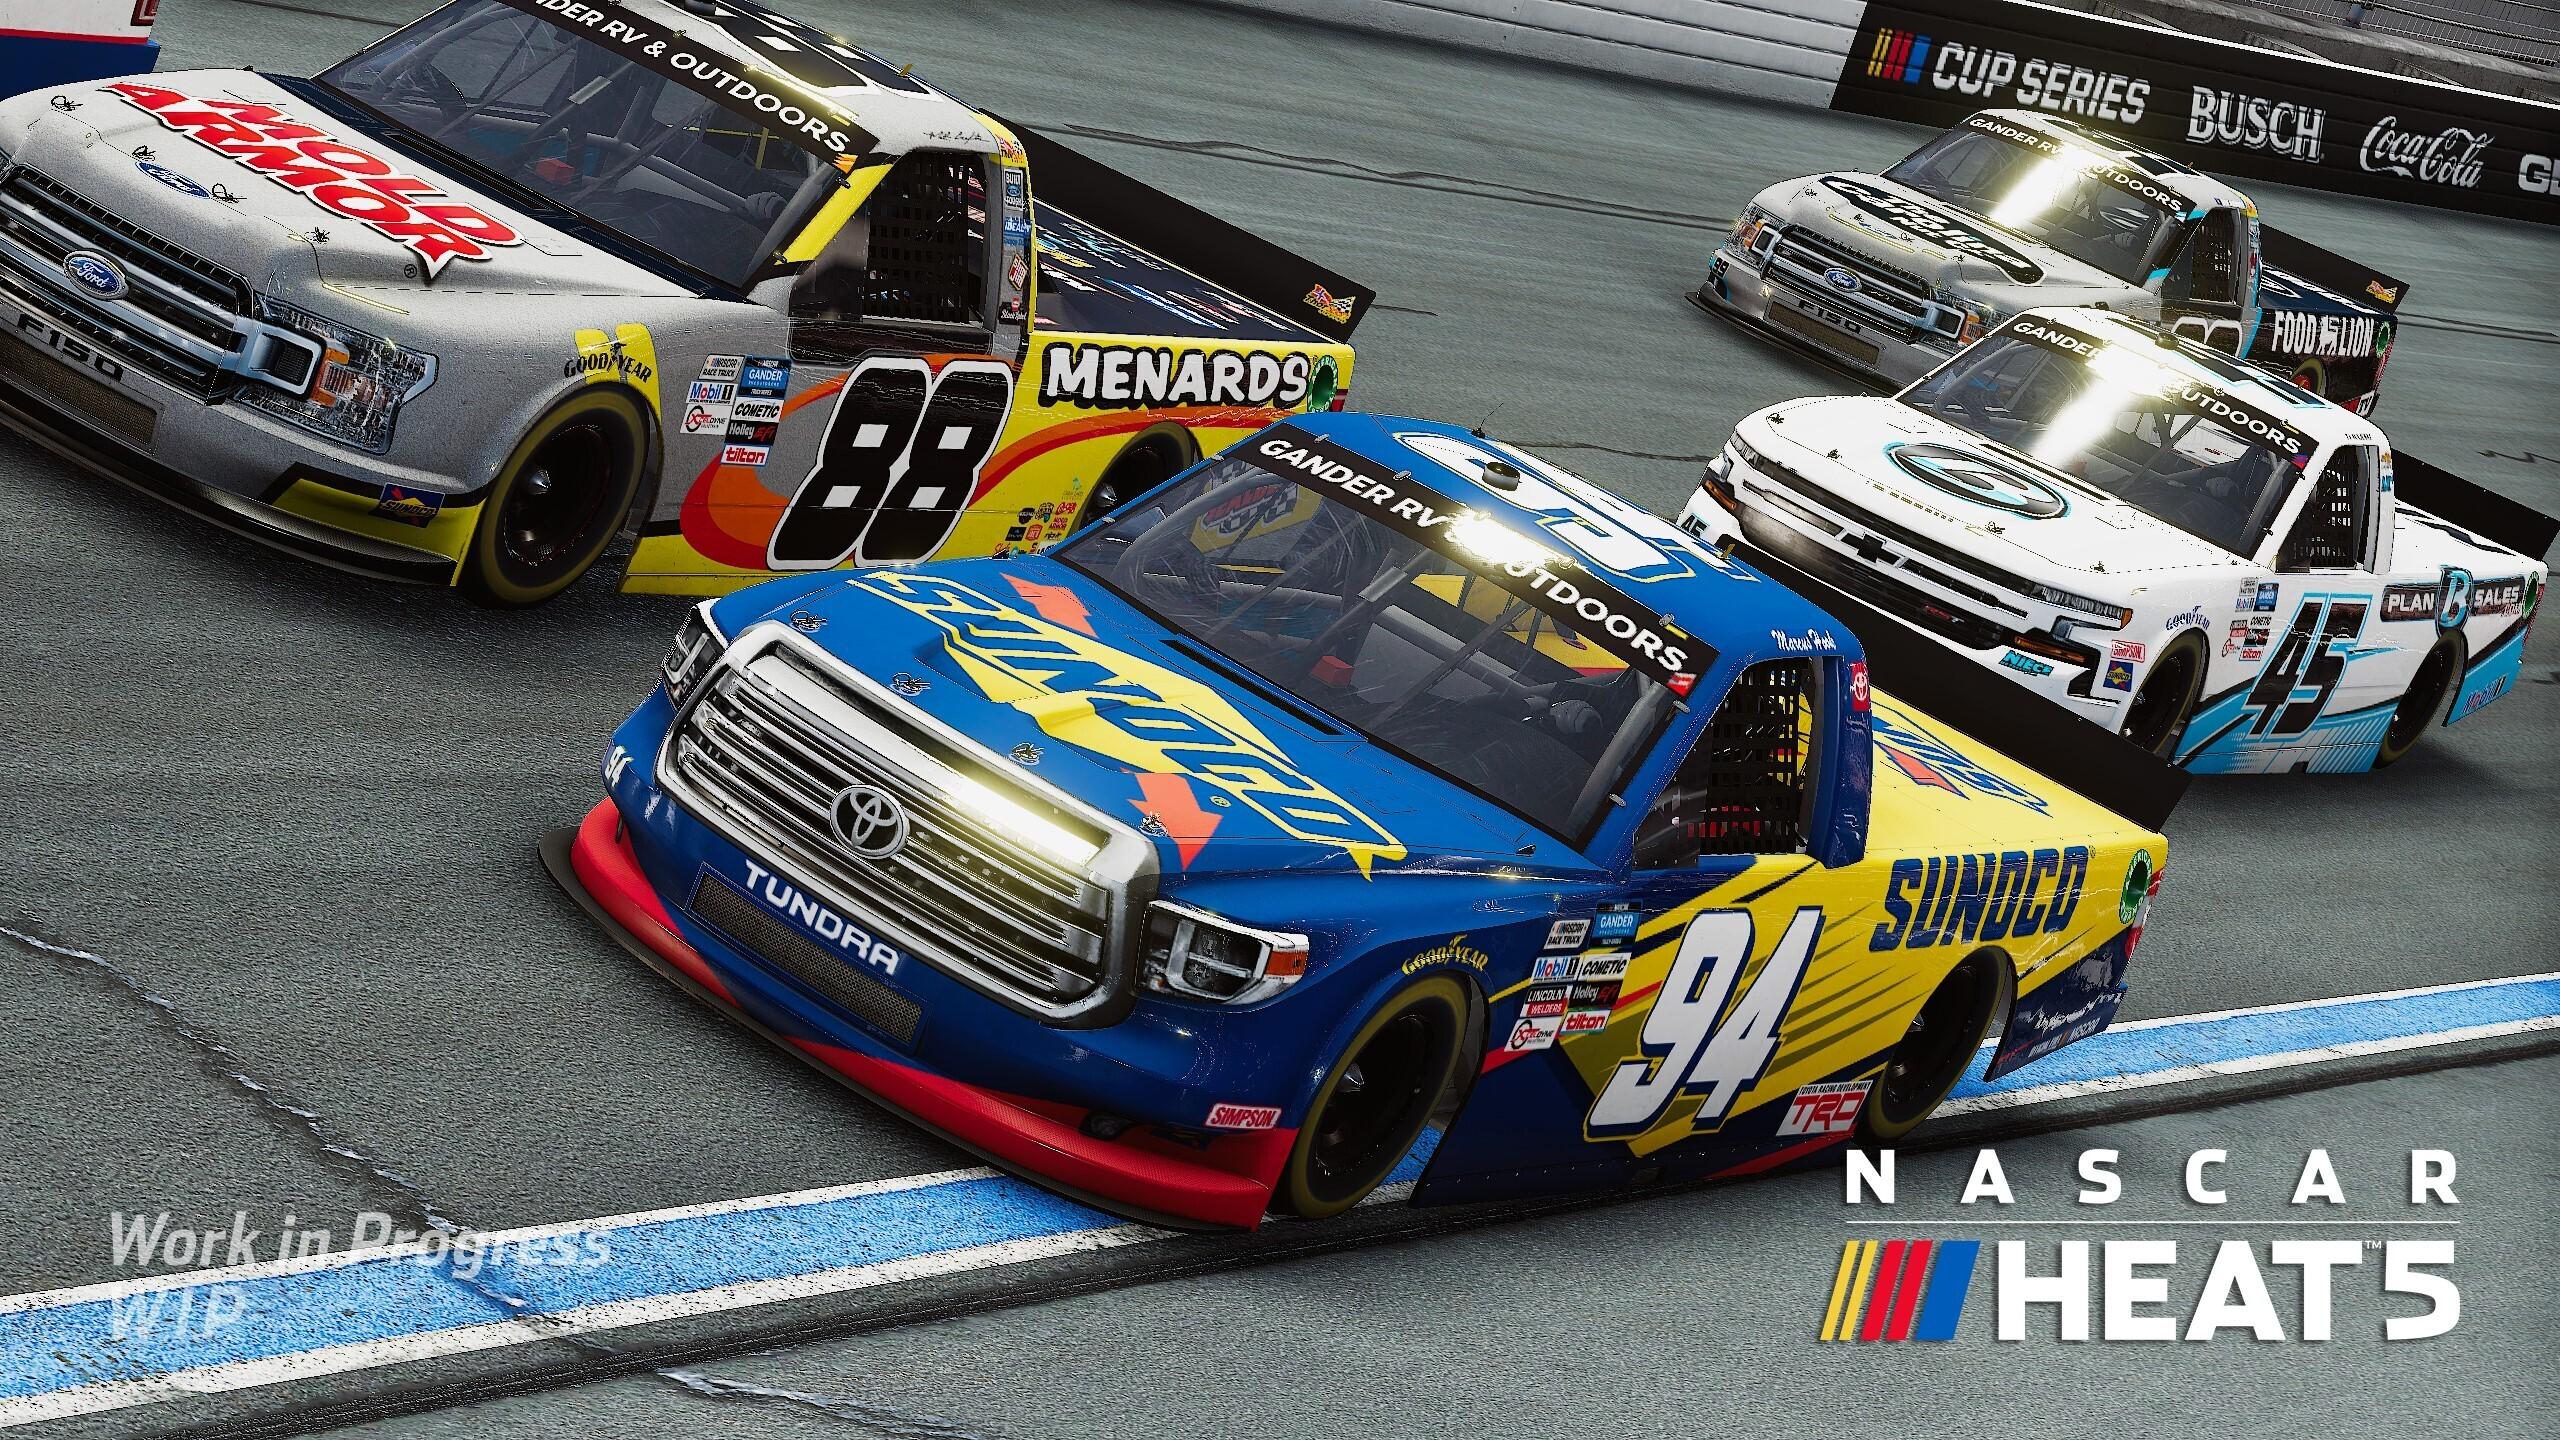 NASCAR Heat 5 Artwork